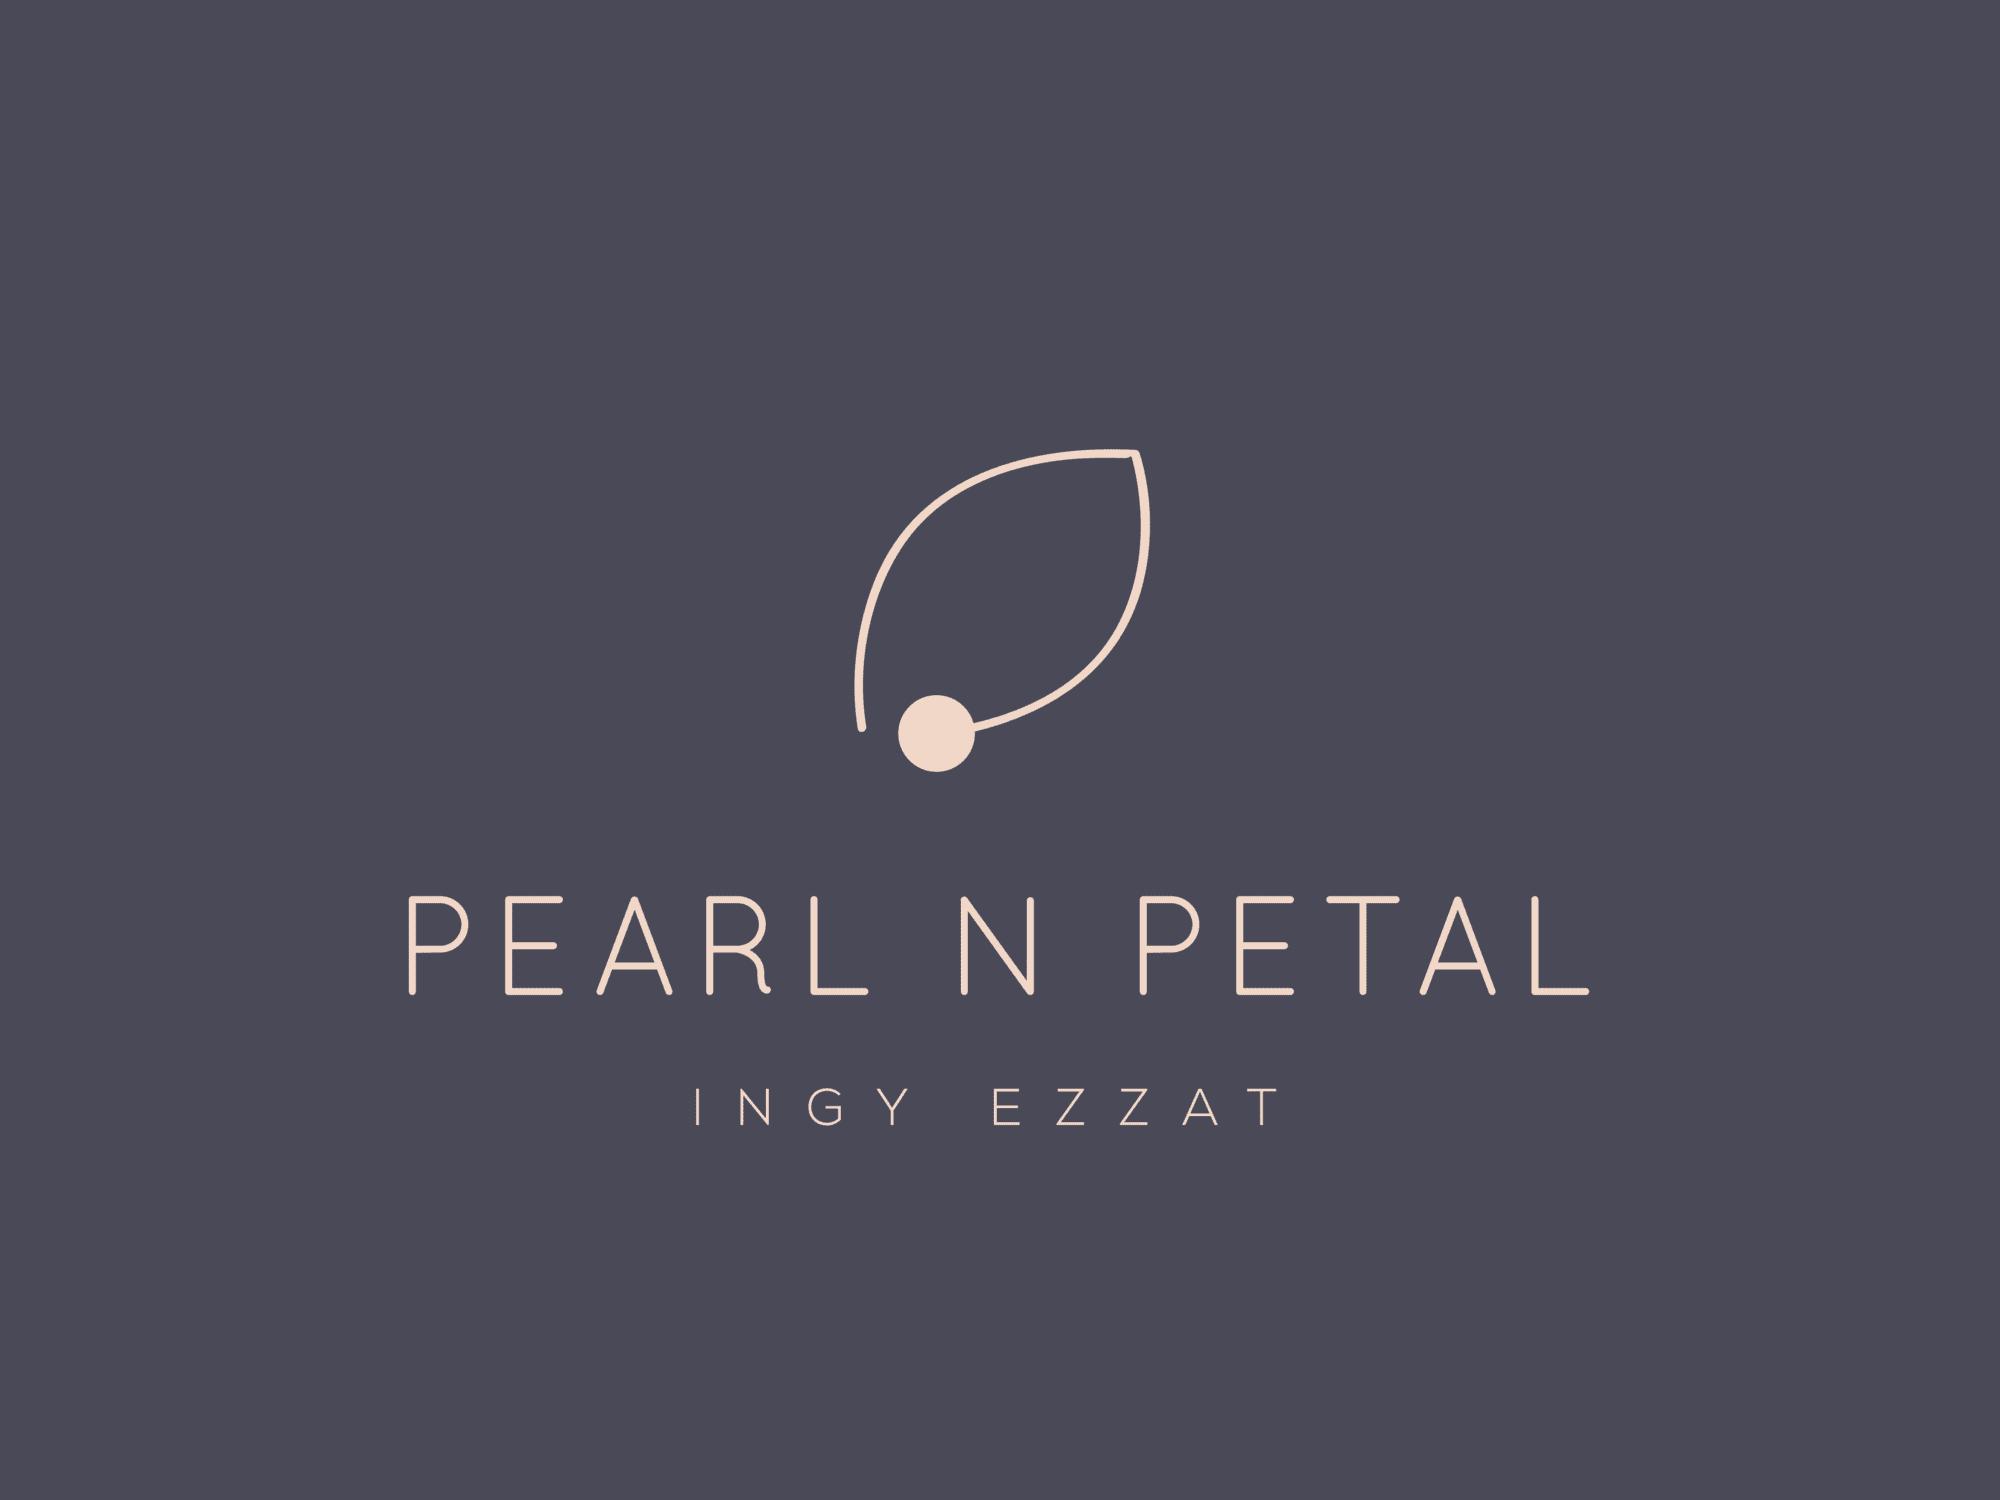 PearlNPetalFInal-1